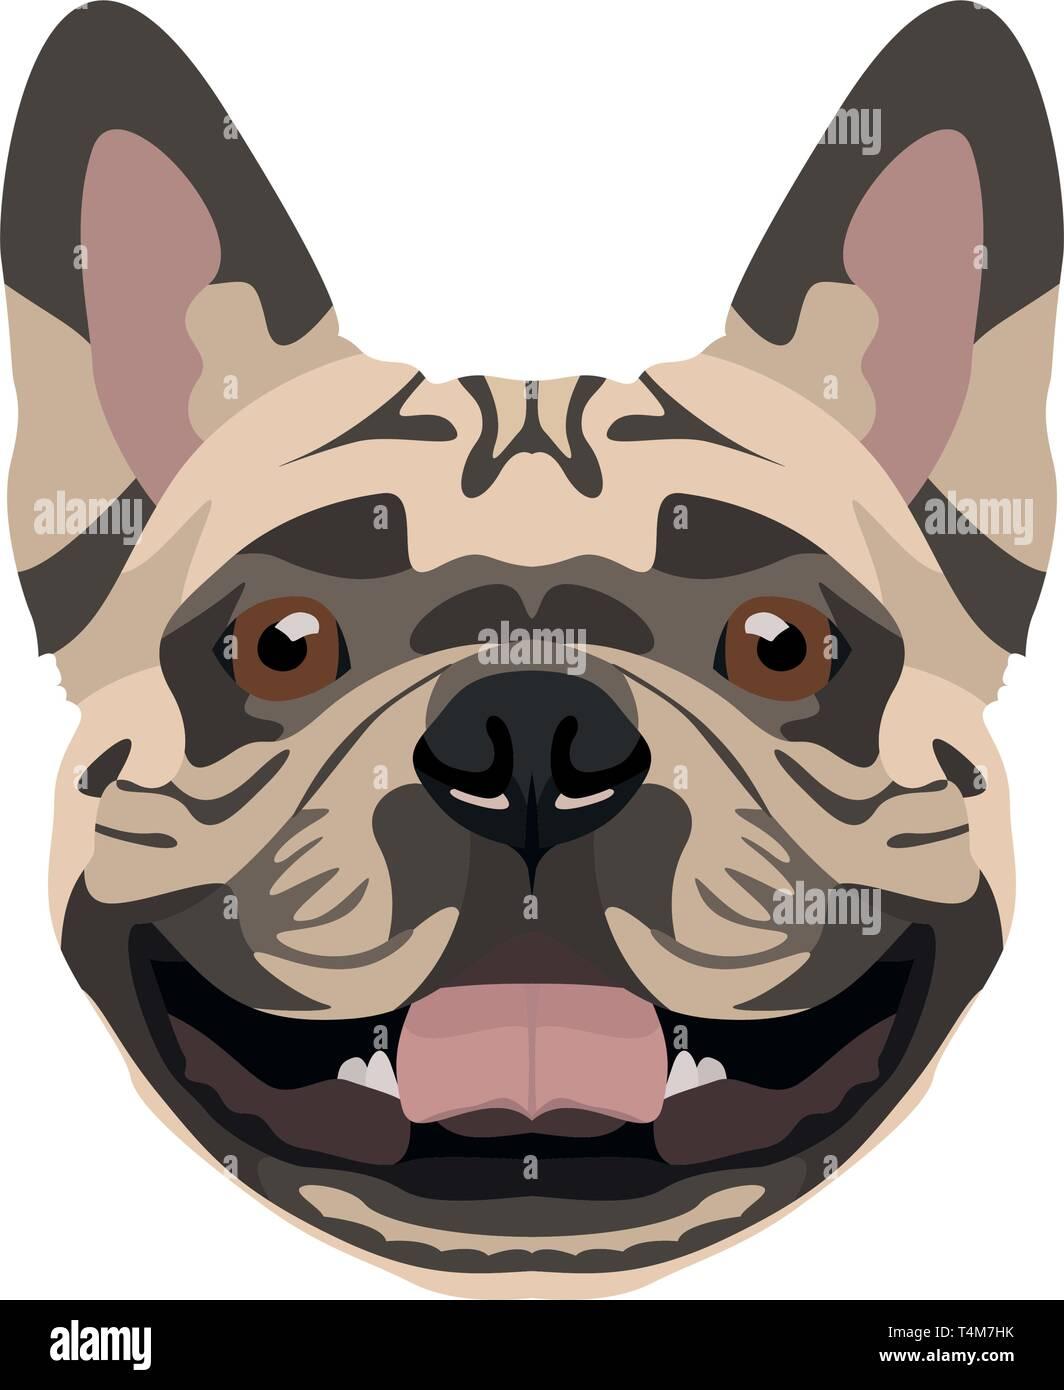 French bulldog tail immagini & french bulldog tail fotos stock alamy